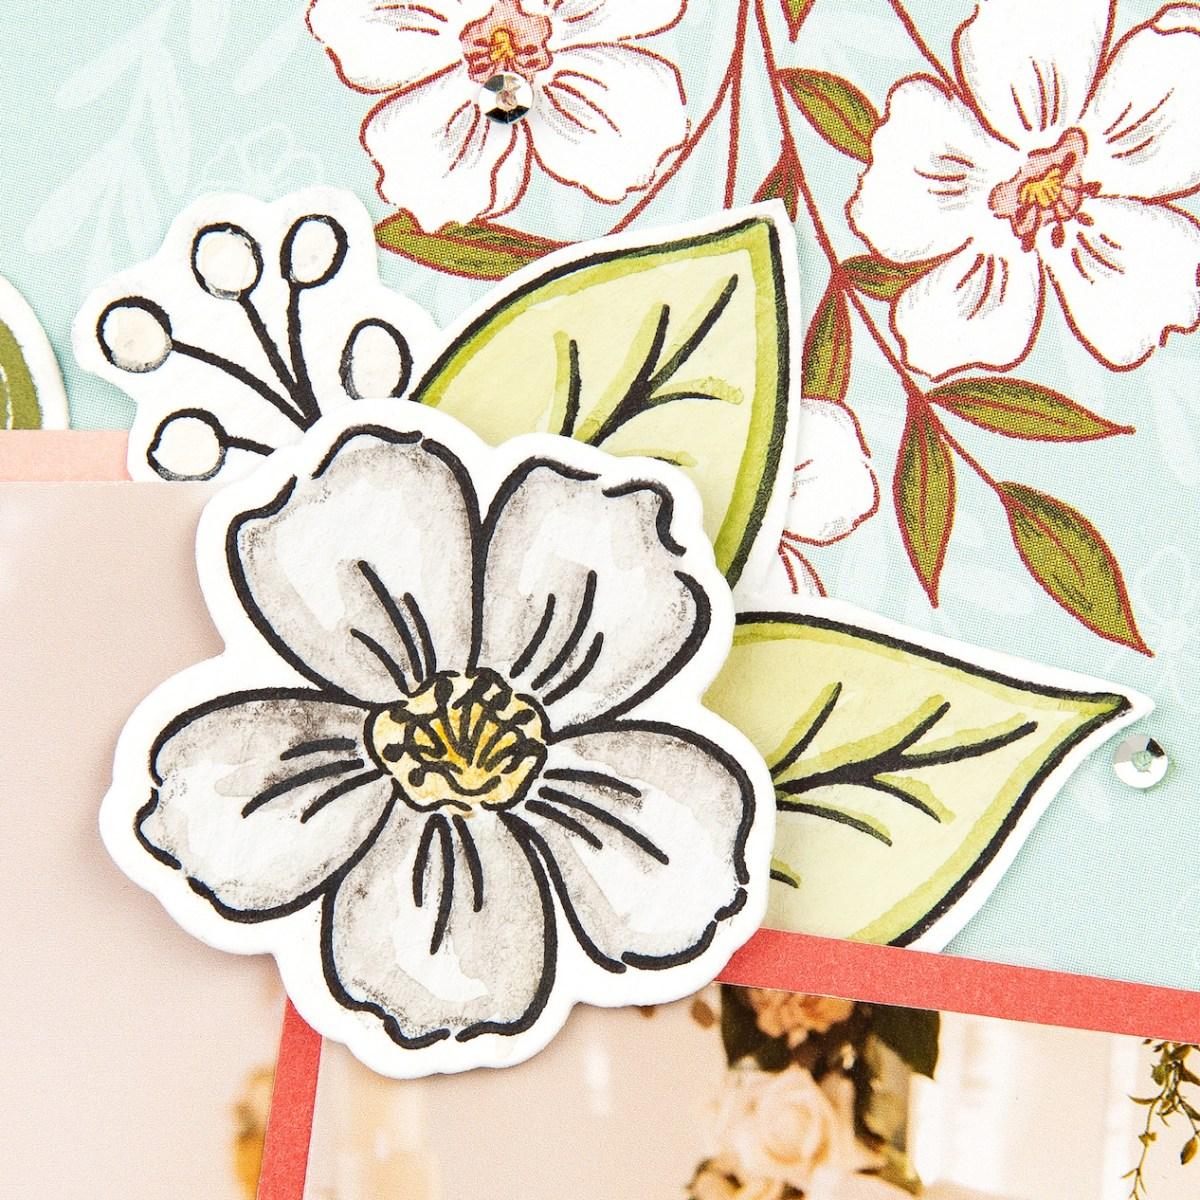 Watercolor Techniques #closetomyheart #ctmh #ctmhdaisymeadows #watercolor #watercolour #waterbrush #watercolorpencils #watercolourpencils #watercolortechniques #watercolourtechniques #scrapbooking #cardmaking